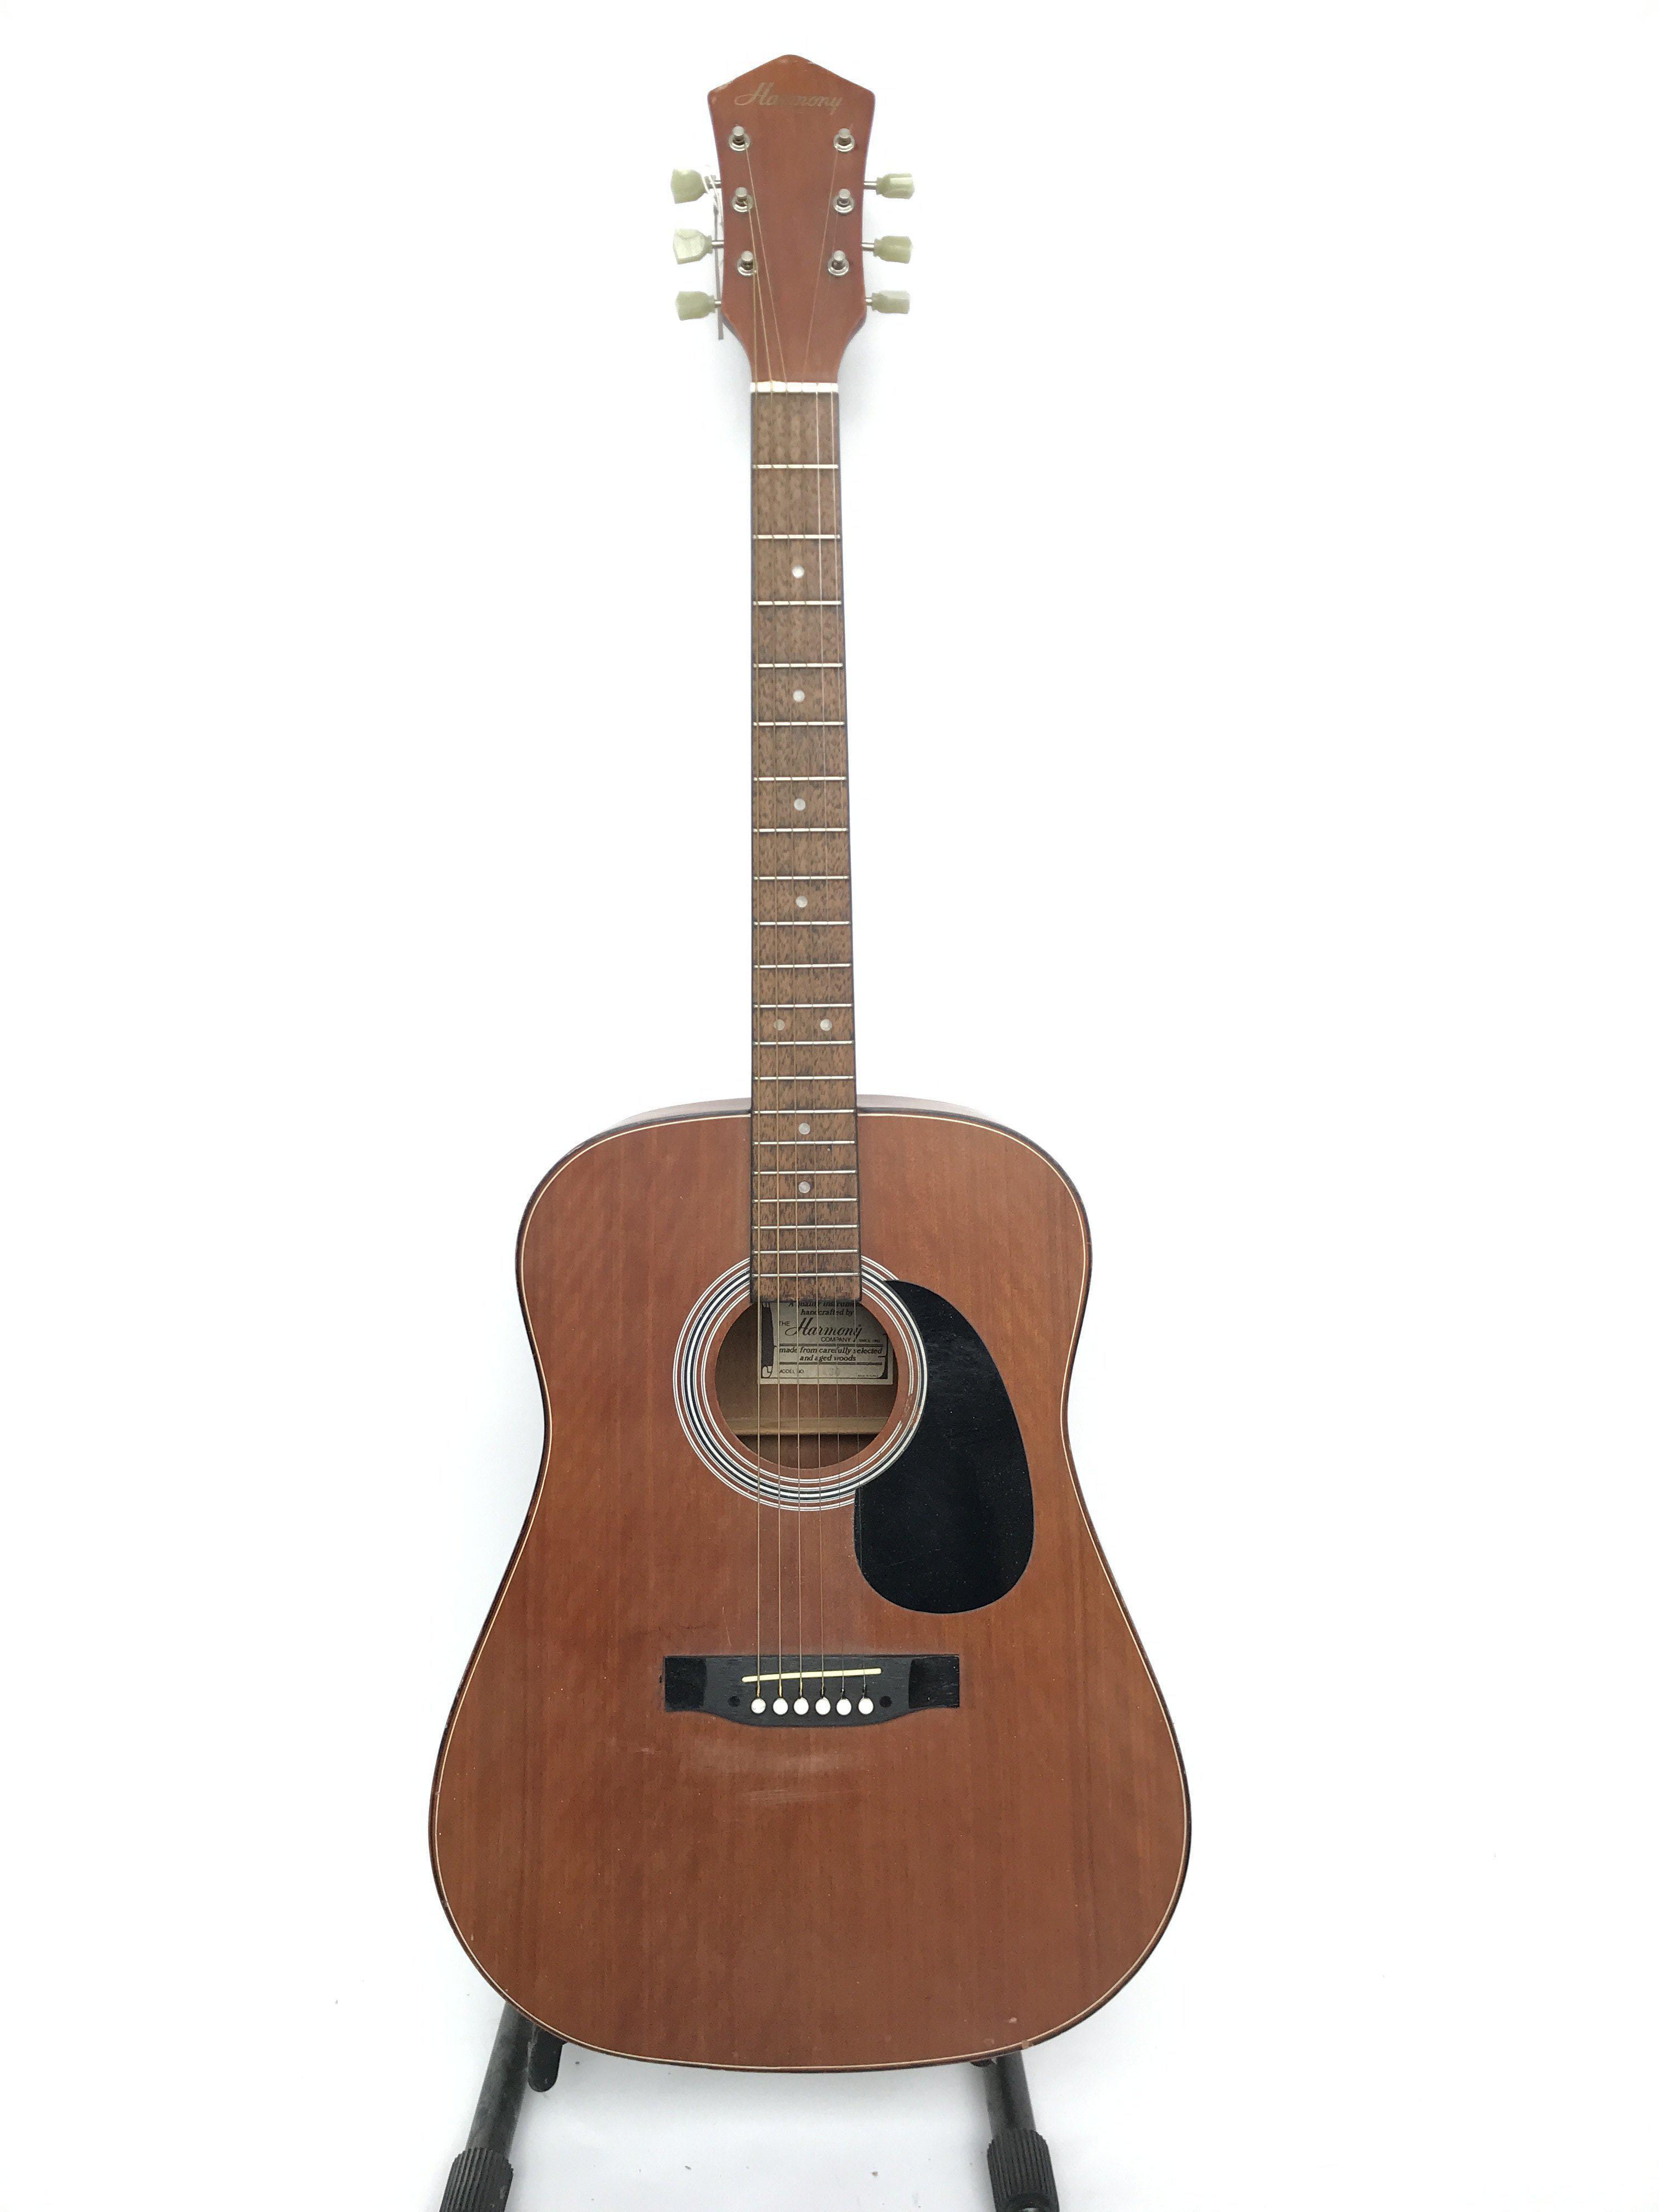 A vintage Korean made Harmony acoustic guitar (mod